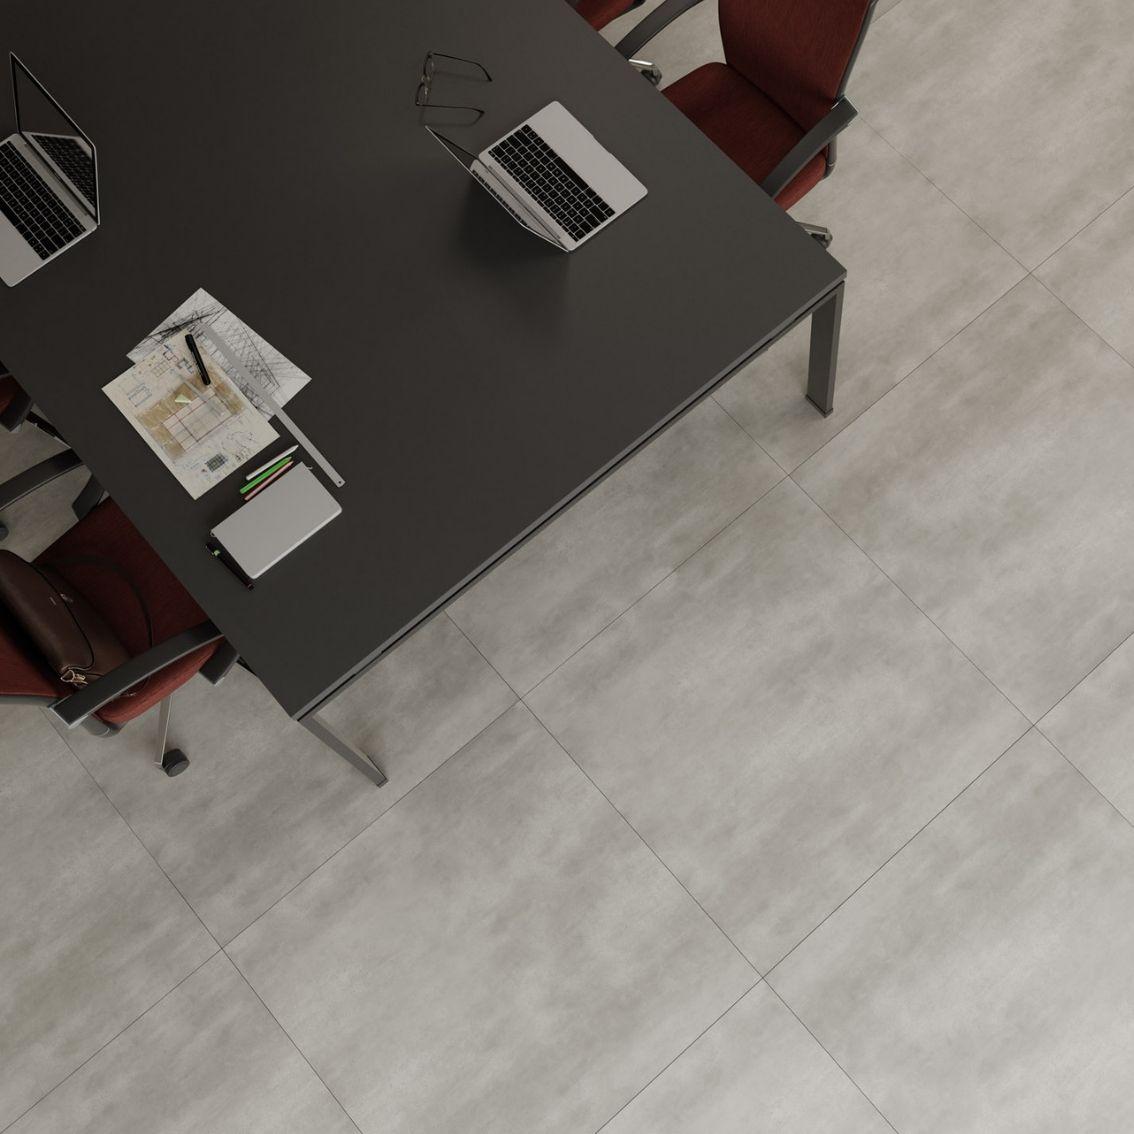 Citta Cemento Grigio 91,4x91,4 cm <br /><b>R$ 169,90 M² </b><br />Cx 4,18 M² <b> R$ 710,18</b>